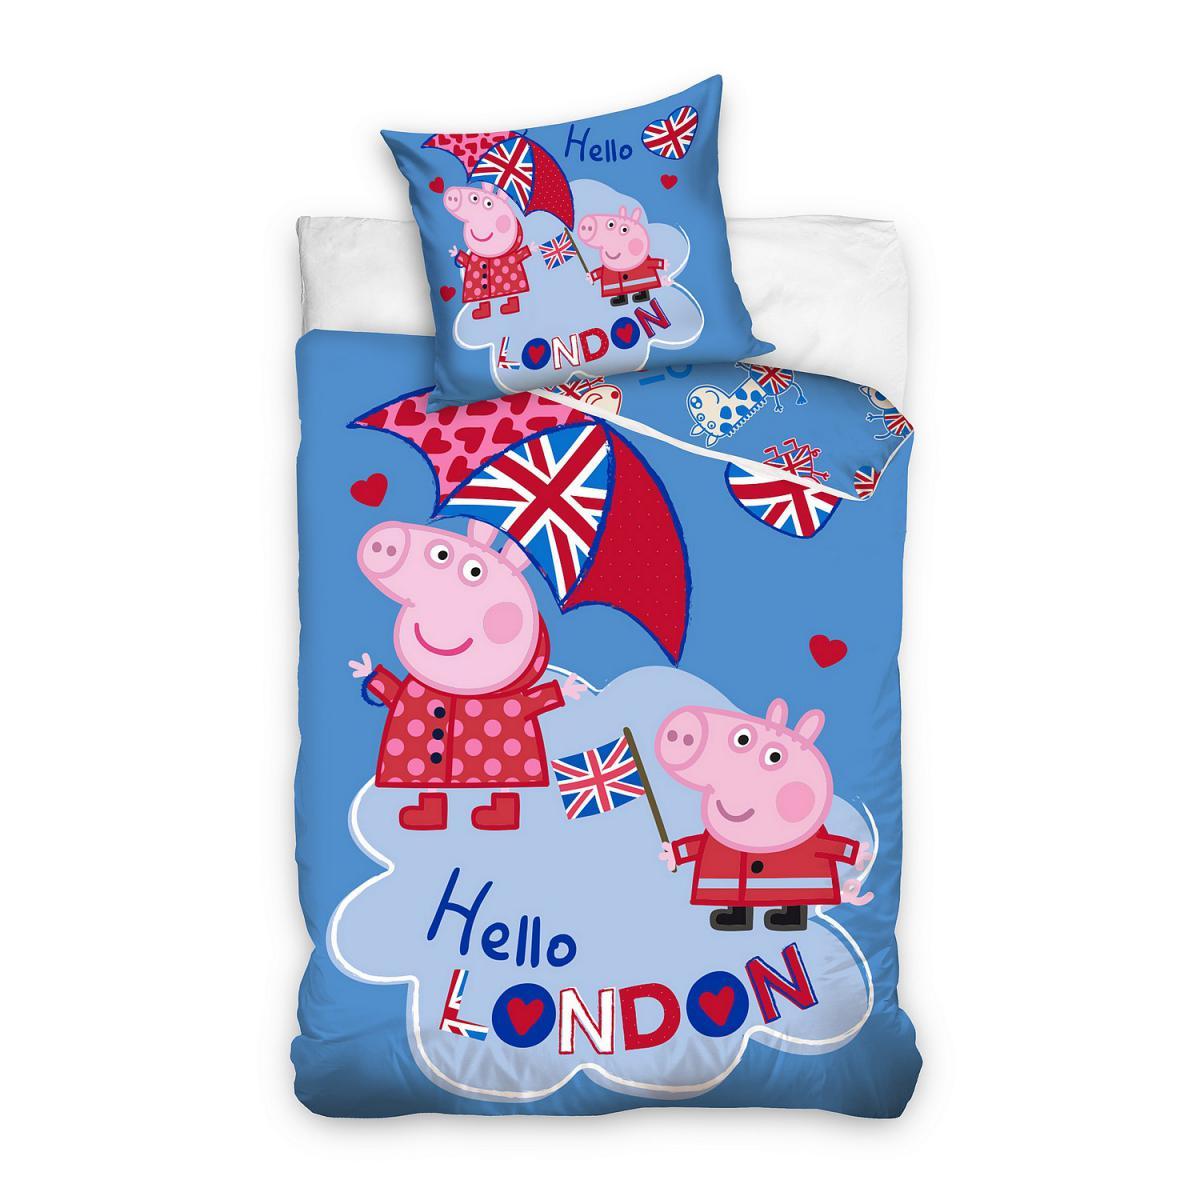 Carbotex Parure de lit Peppa Pig Hello London Nickelodeon 140x200cm